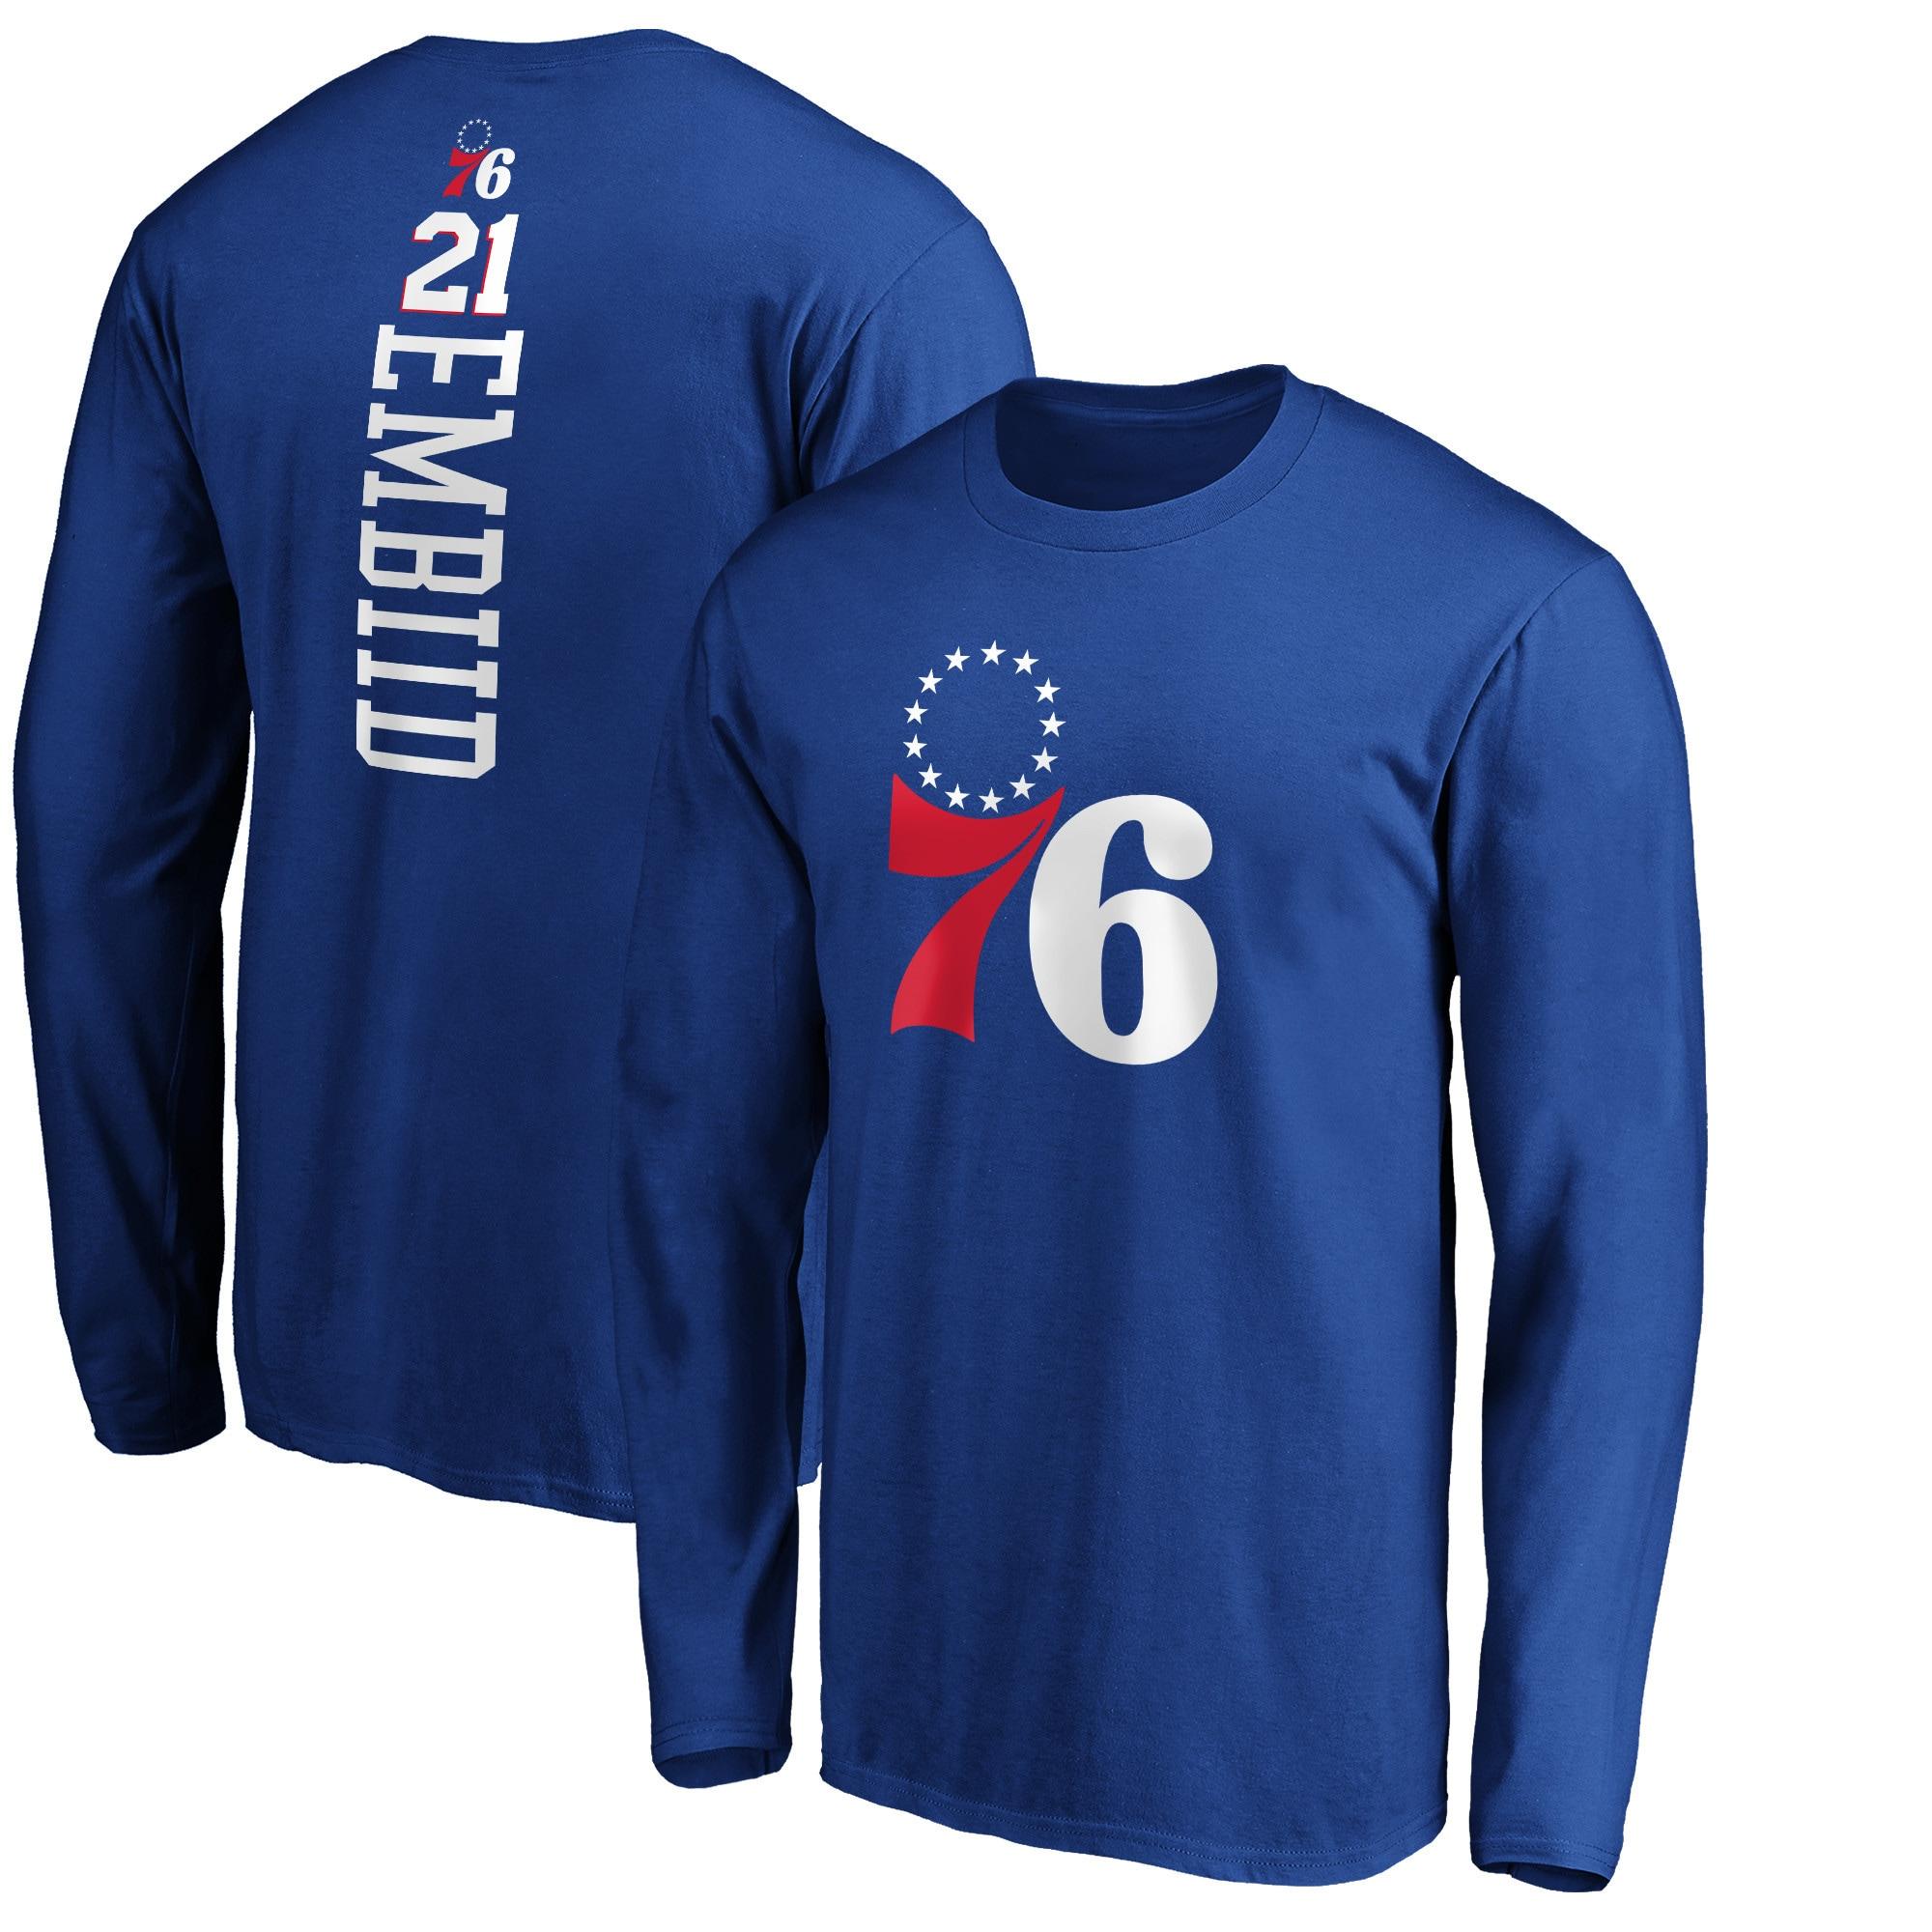 Joel Embiid Philadelphia 76ers Fanatics Branded Team Playmaker Name & Number Long Sleeve T-Shirt - Royal